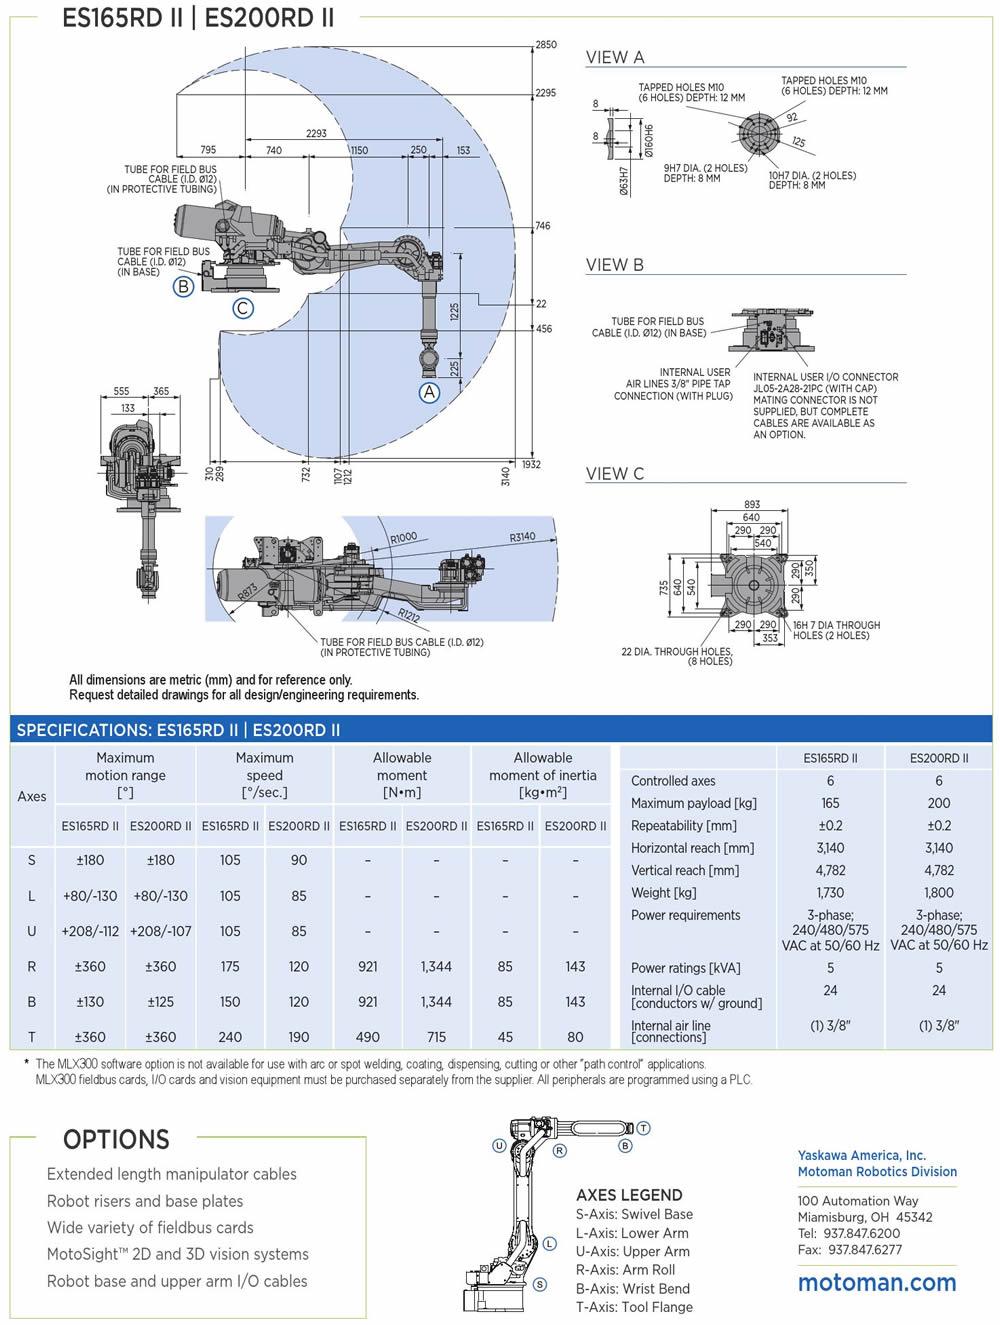 Robot Yaskawa Motoman ES165D-100 - Thông số